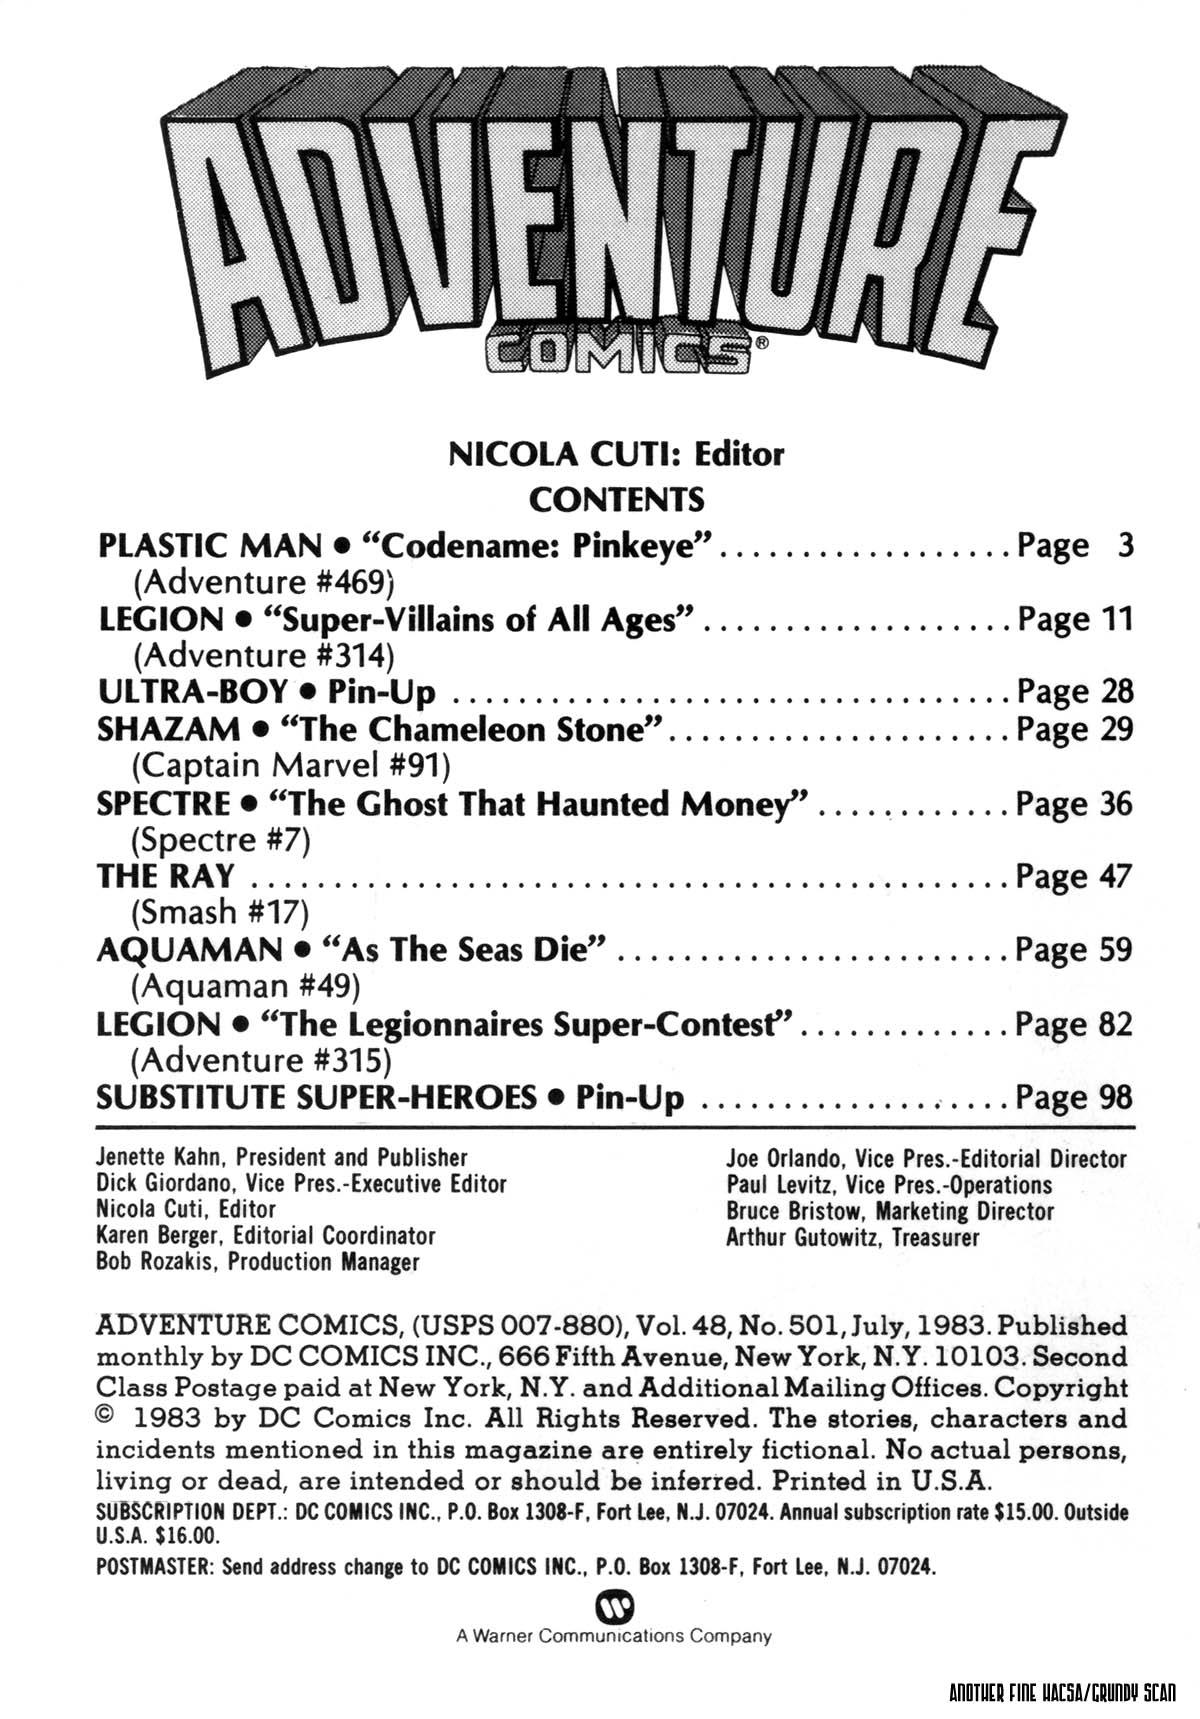 Read online Adventure Comics (1938) comic -  Issue #501 - 2